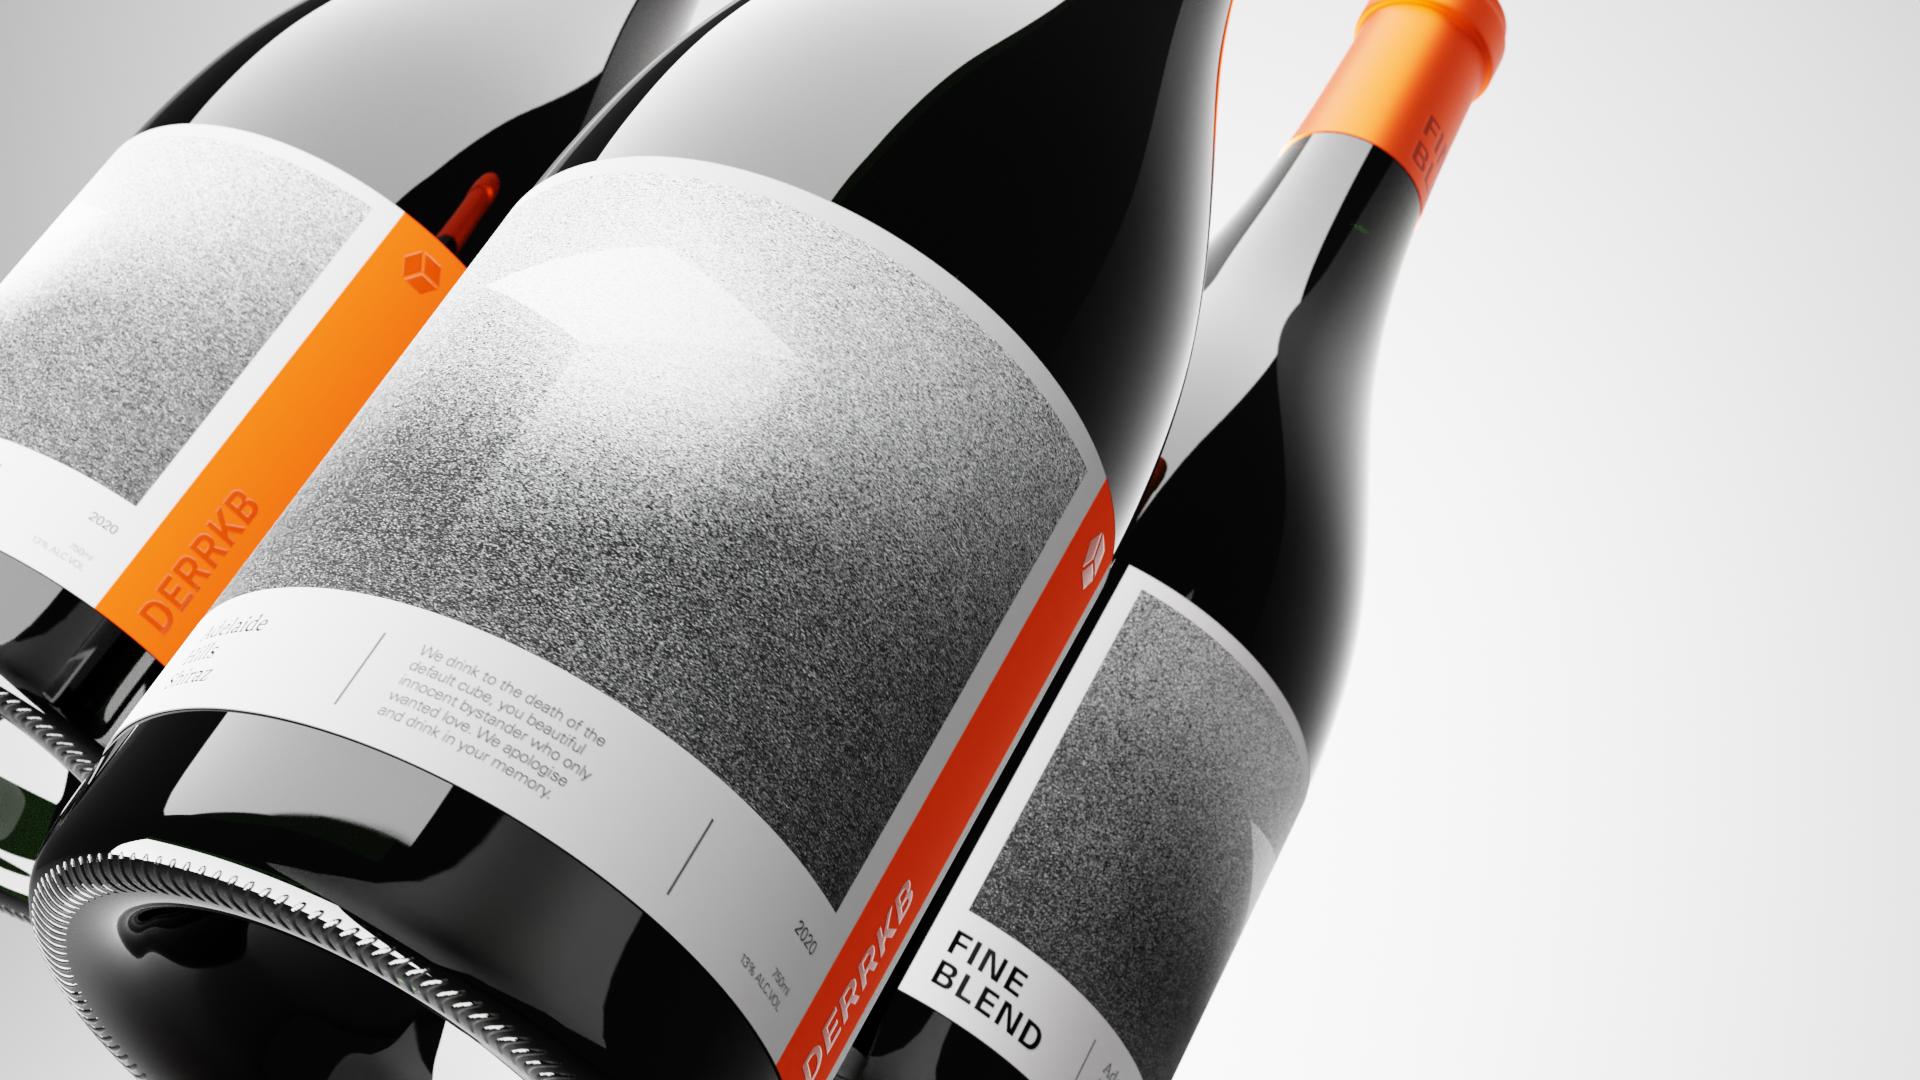 bottles of fine wine